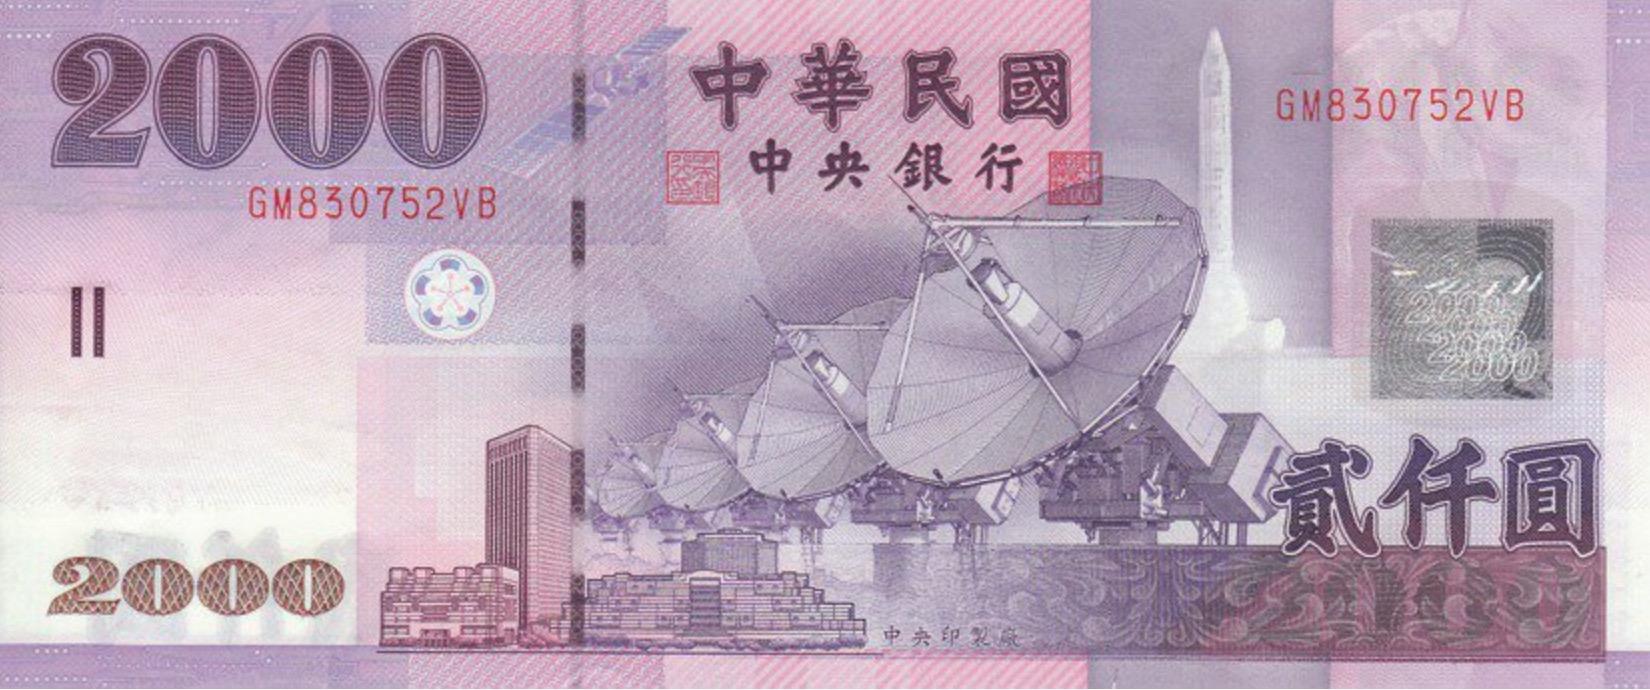 2000 New Taiwan Dollar banknote